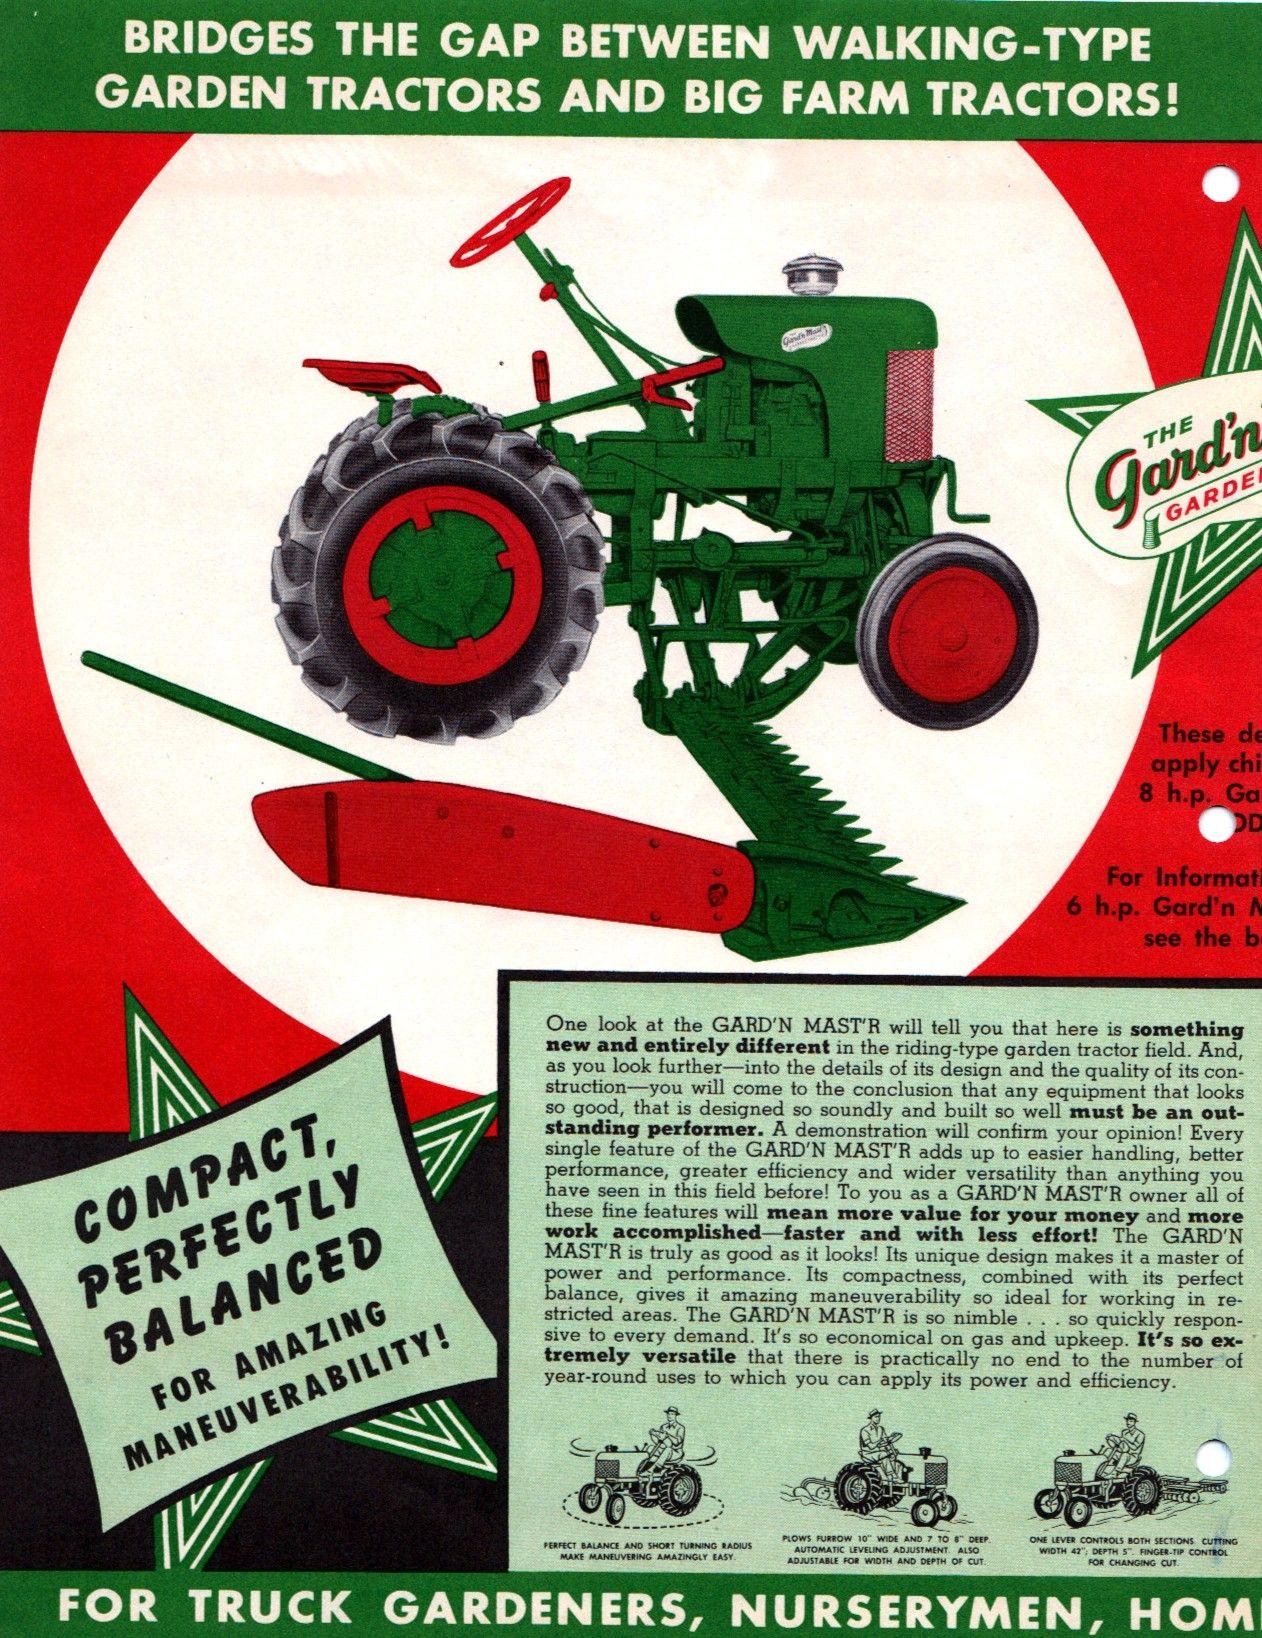 gard n mast r g sales literature page 2 tractor mower lawn tractors [ 1262 x 1638 Pixel ]